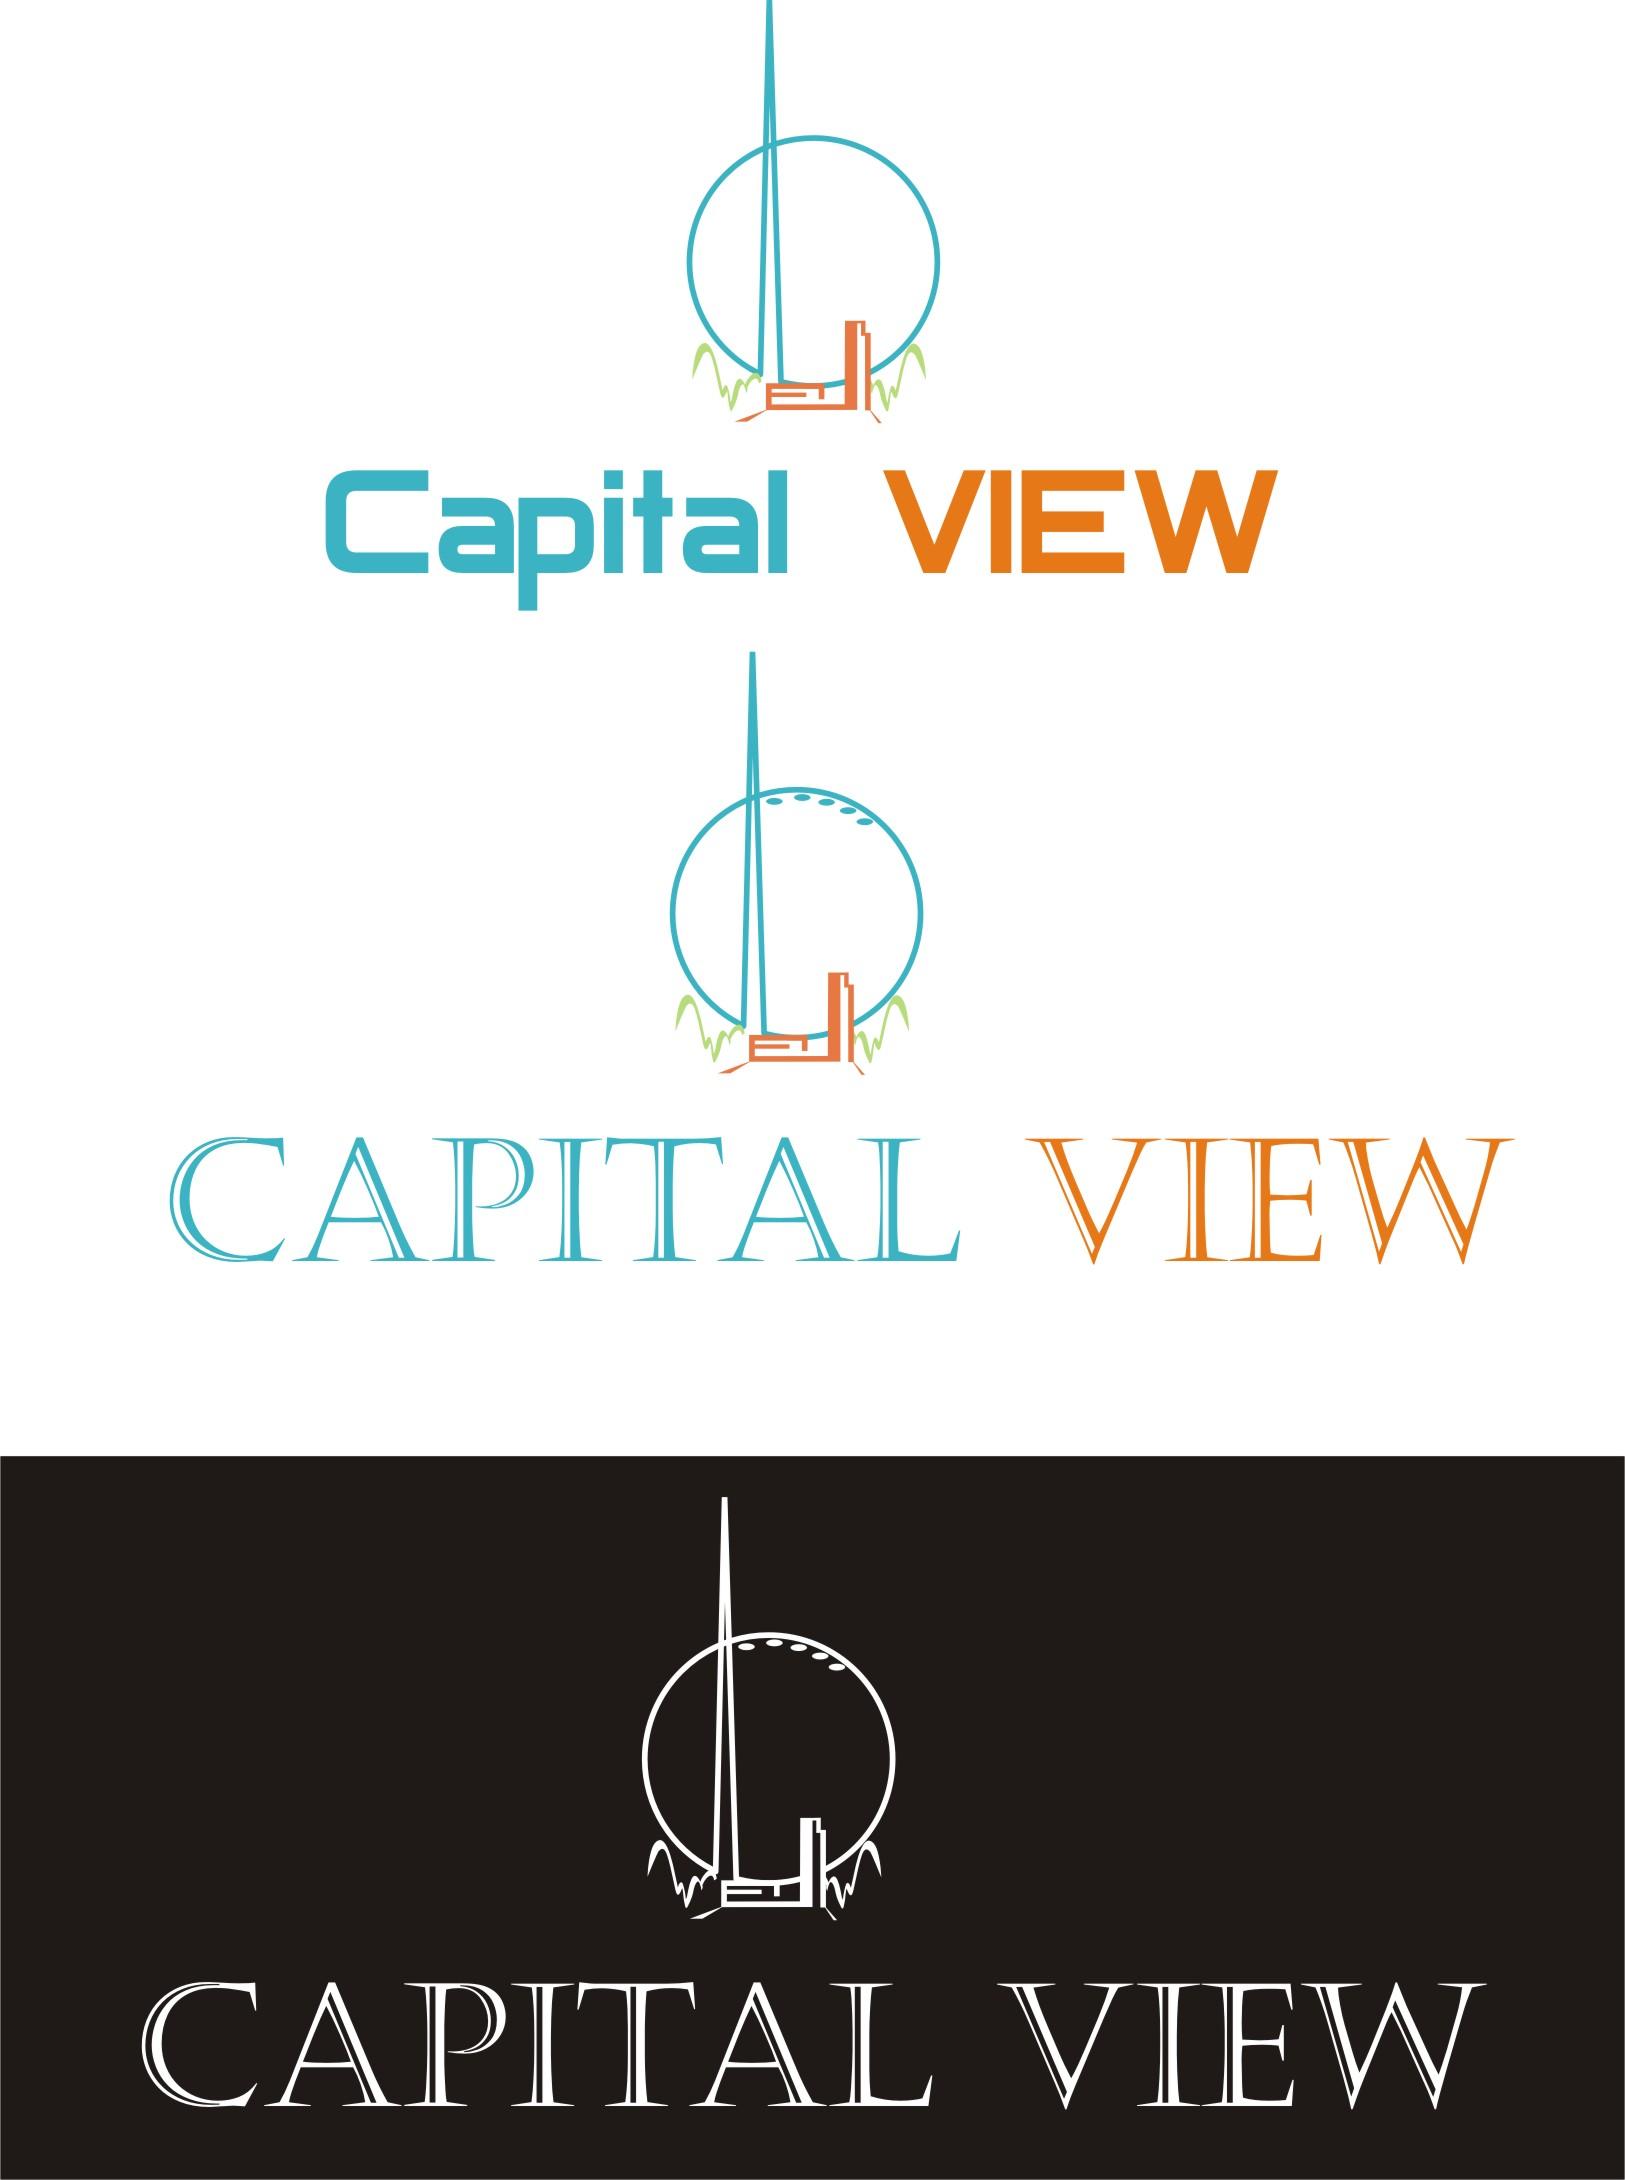 CAPITAL VIEW фото f_4fe2a797eb6a3.jpg